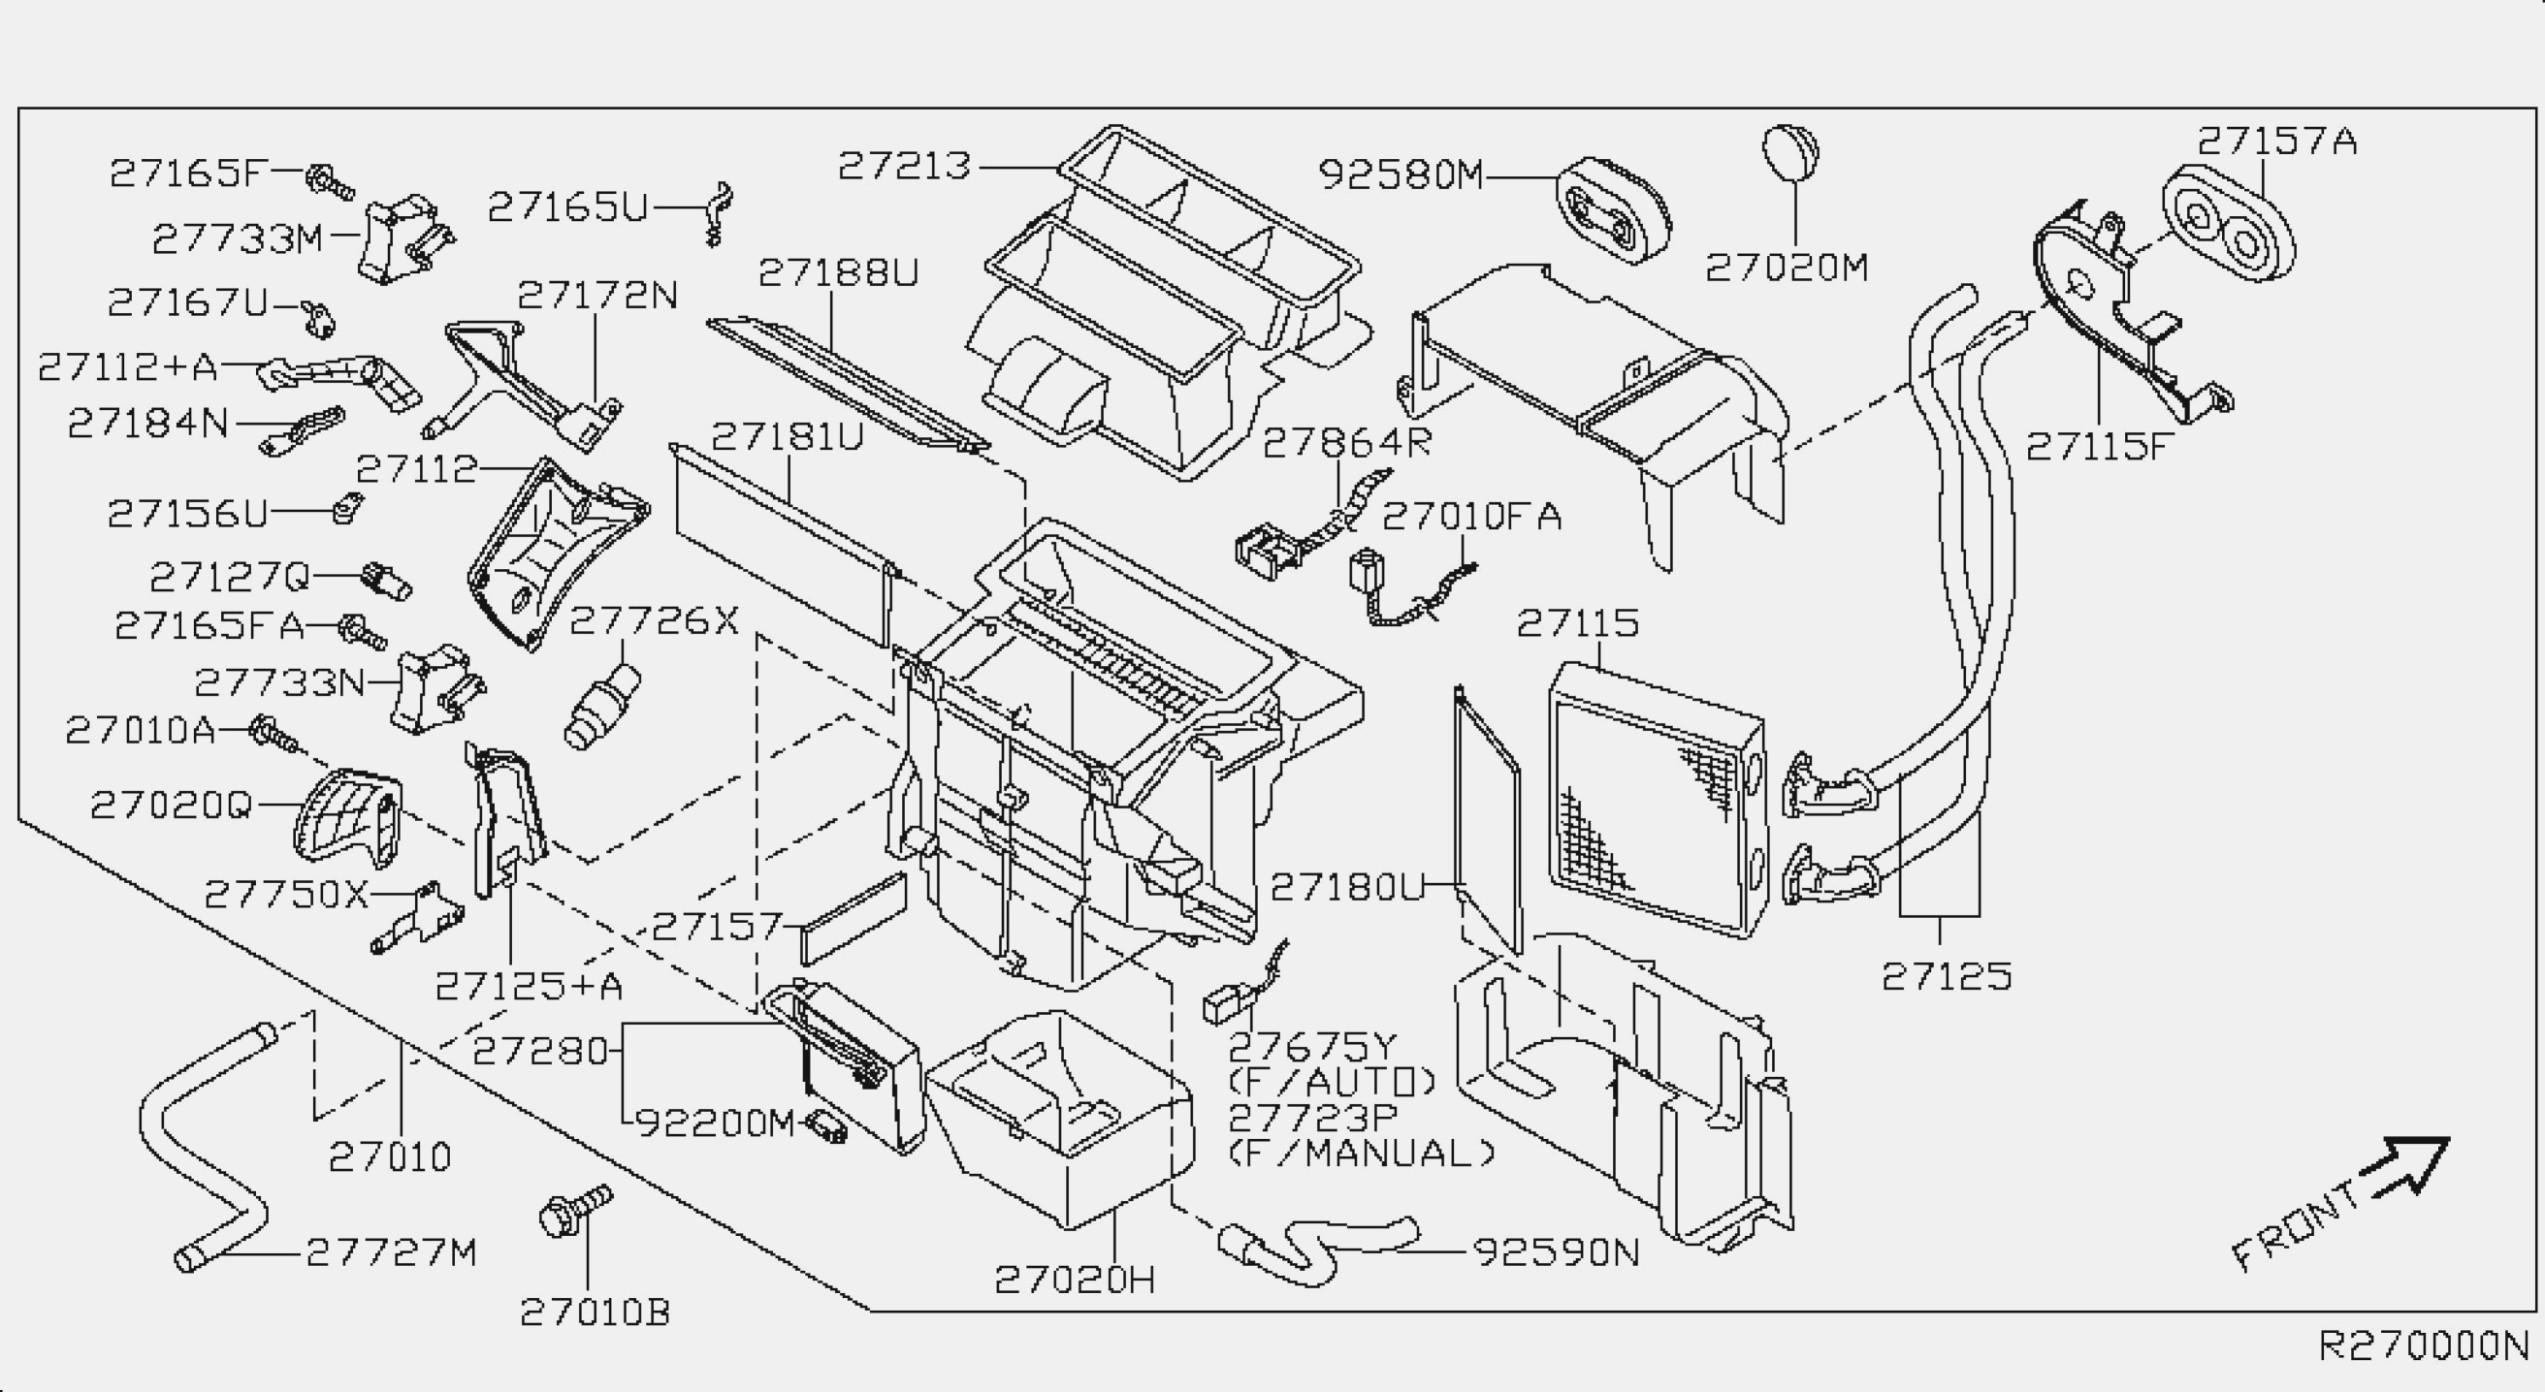 1996 Nissan Maxima Engine Diagram 2010 Nissan Sentra Engine Diagram Wiring Diagram Datasource Of 1996 Nissan Maxima Engine Diagram